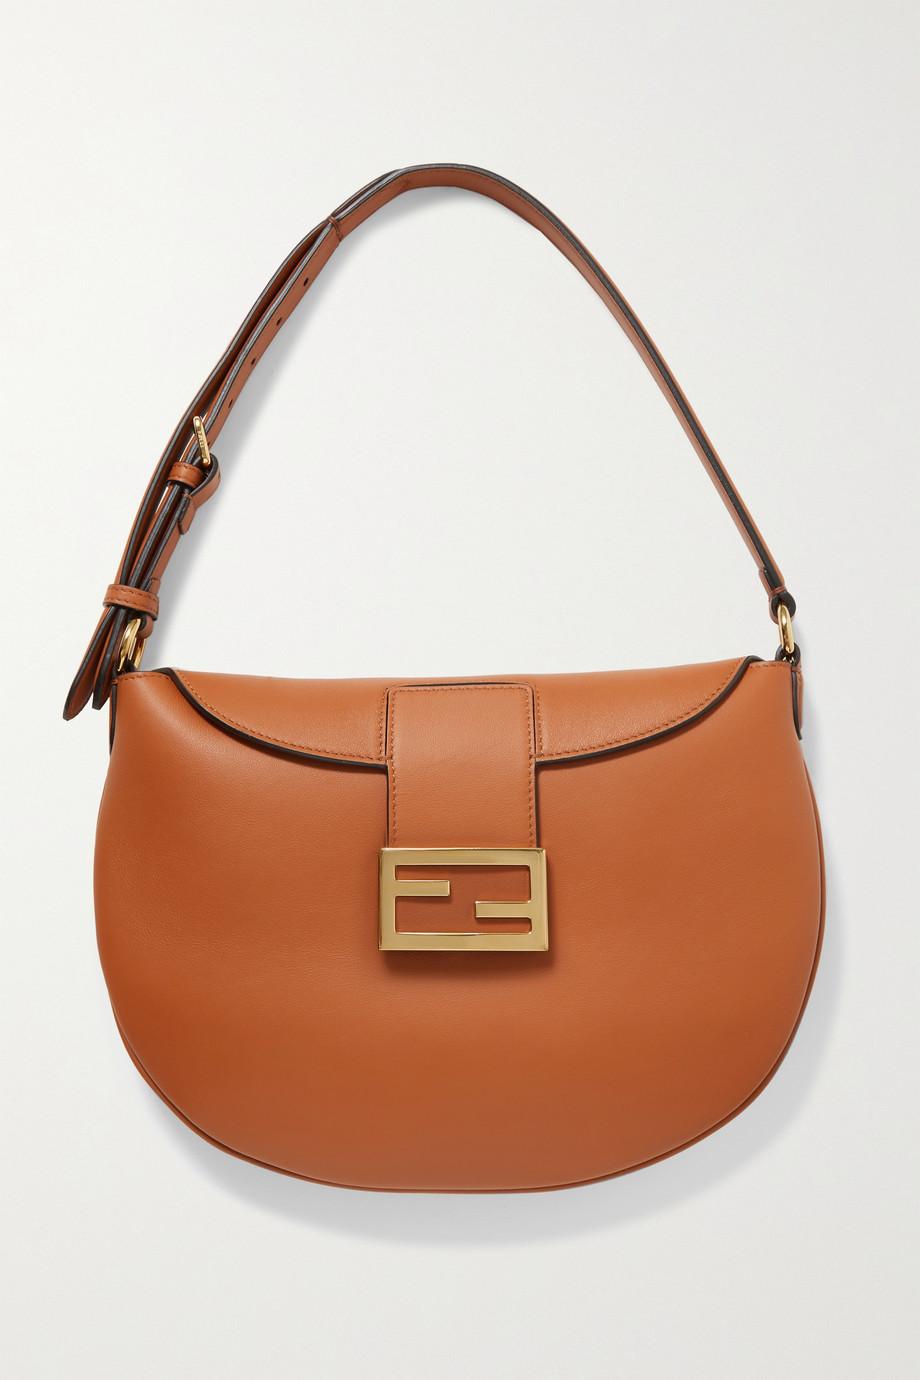 Fendi Croissant medium leather shoulder bag